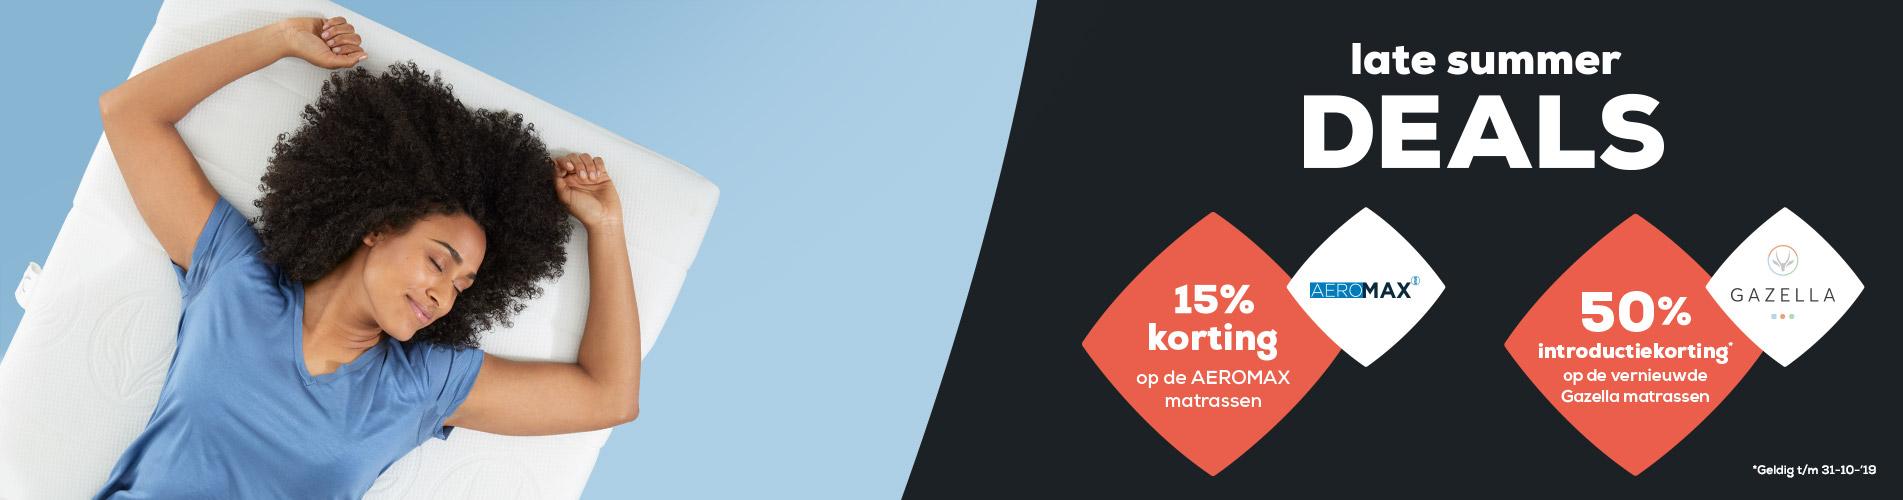 Matrassen | Gazella matrassen 50% introductievoordeel | AEROMAX matrassen 15% korting | Swiss Sense